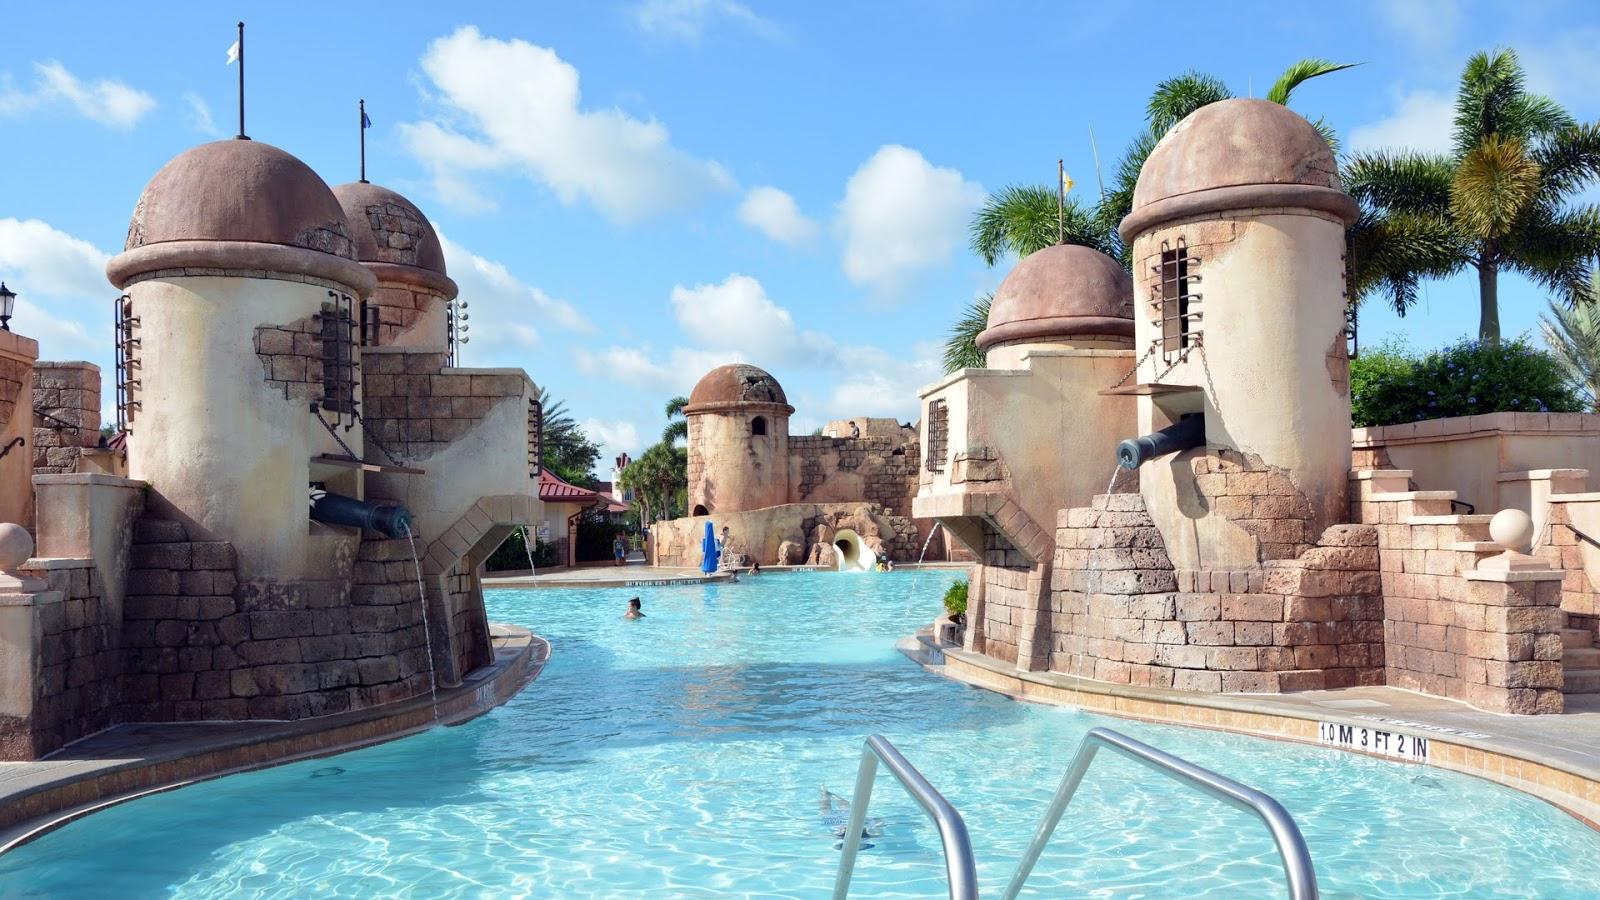 The Disney Fountain of Youth DISNEYS CARIBBEAN BEACH RESORT